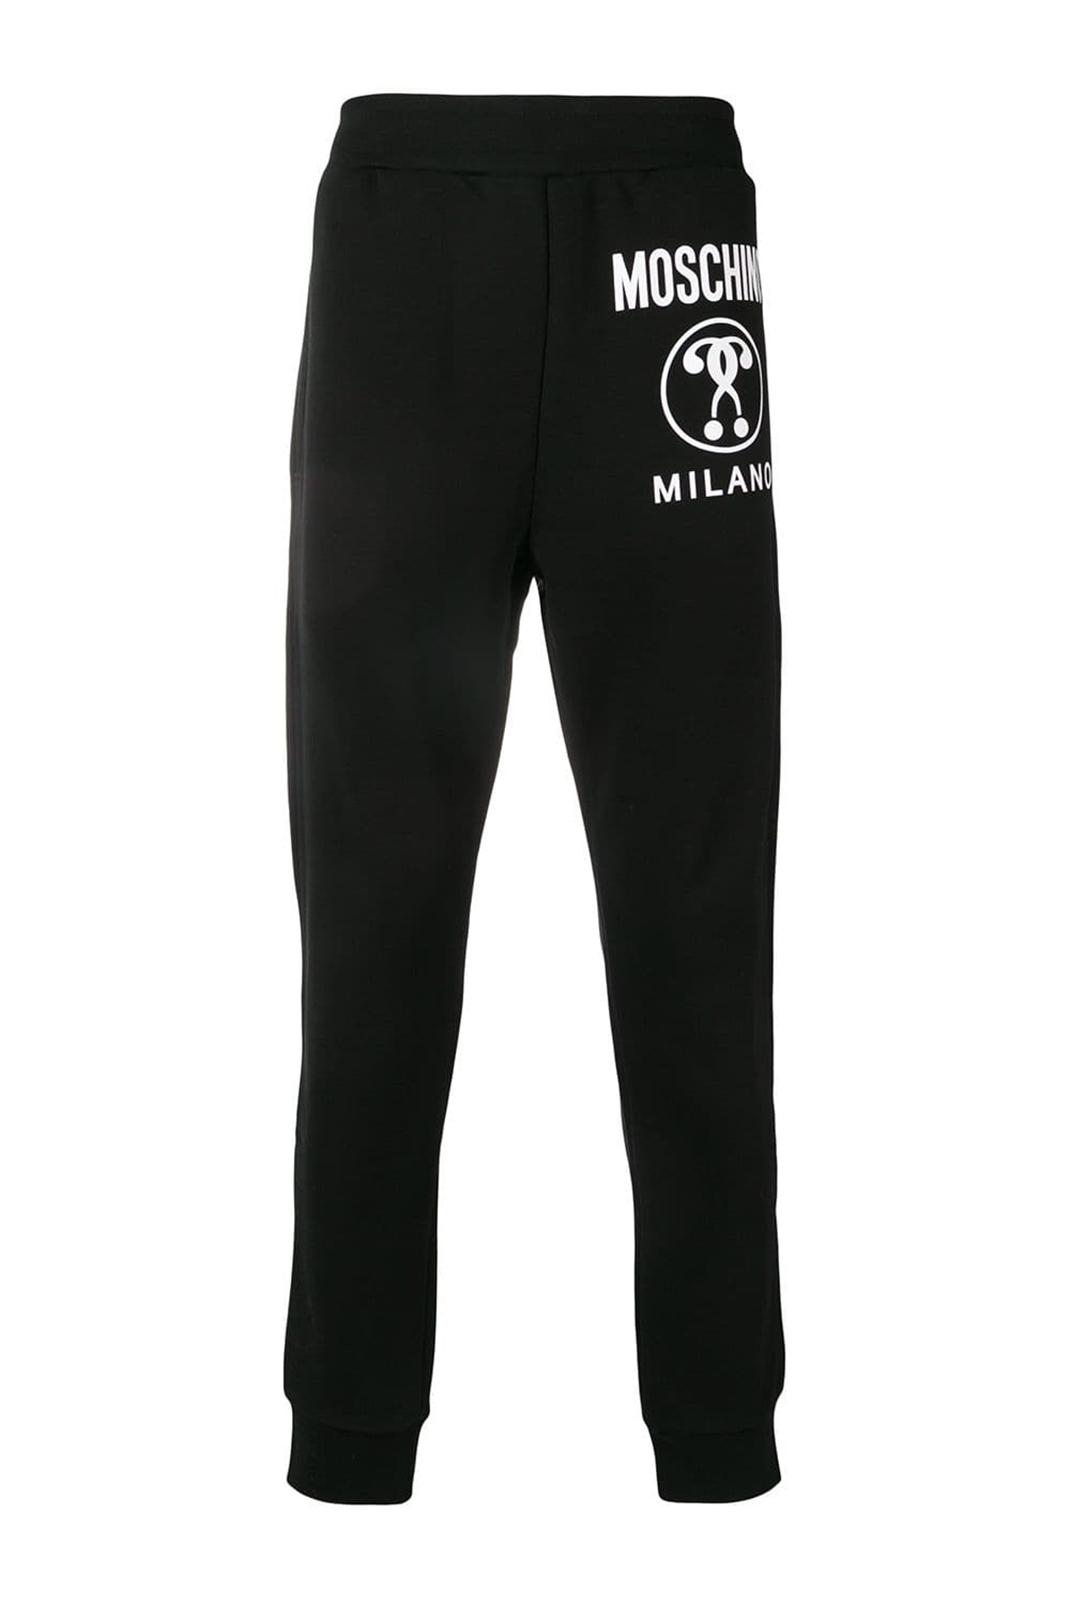 Pantalons  Moschino ZJ0321 5227 1555 NOIR/BLANC